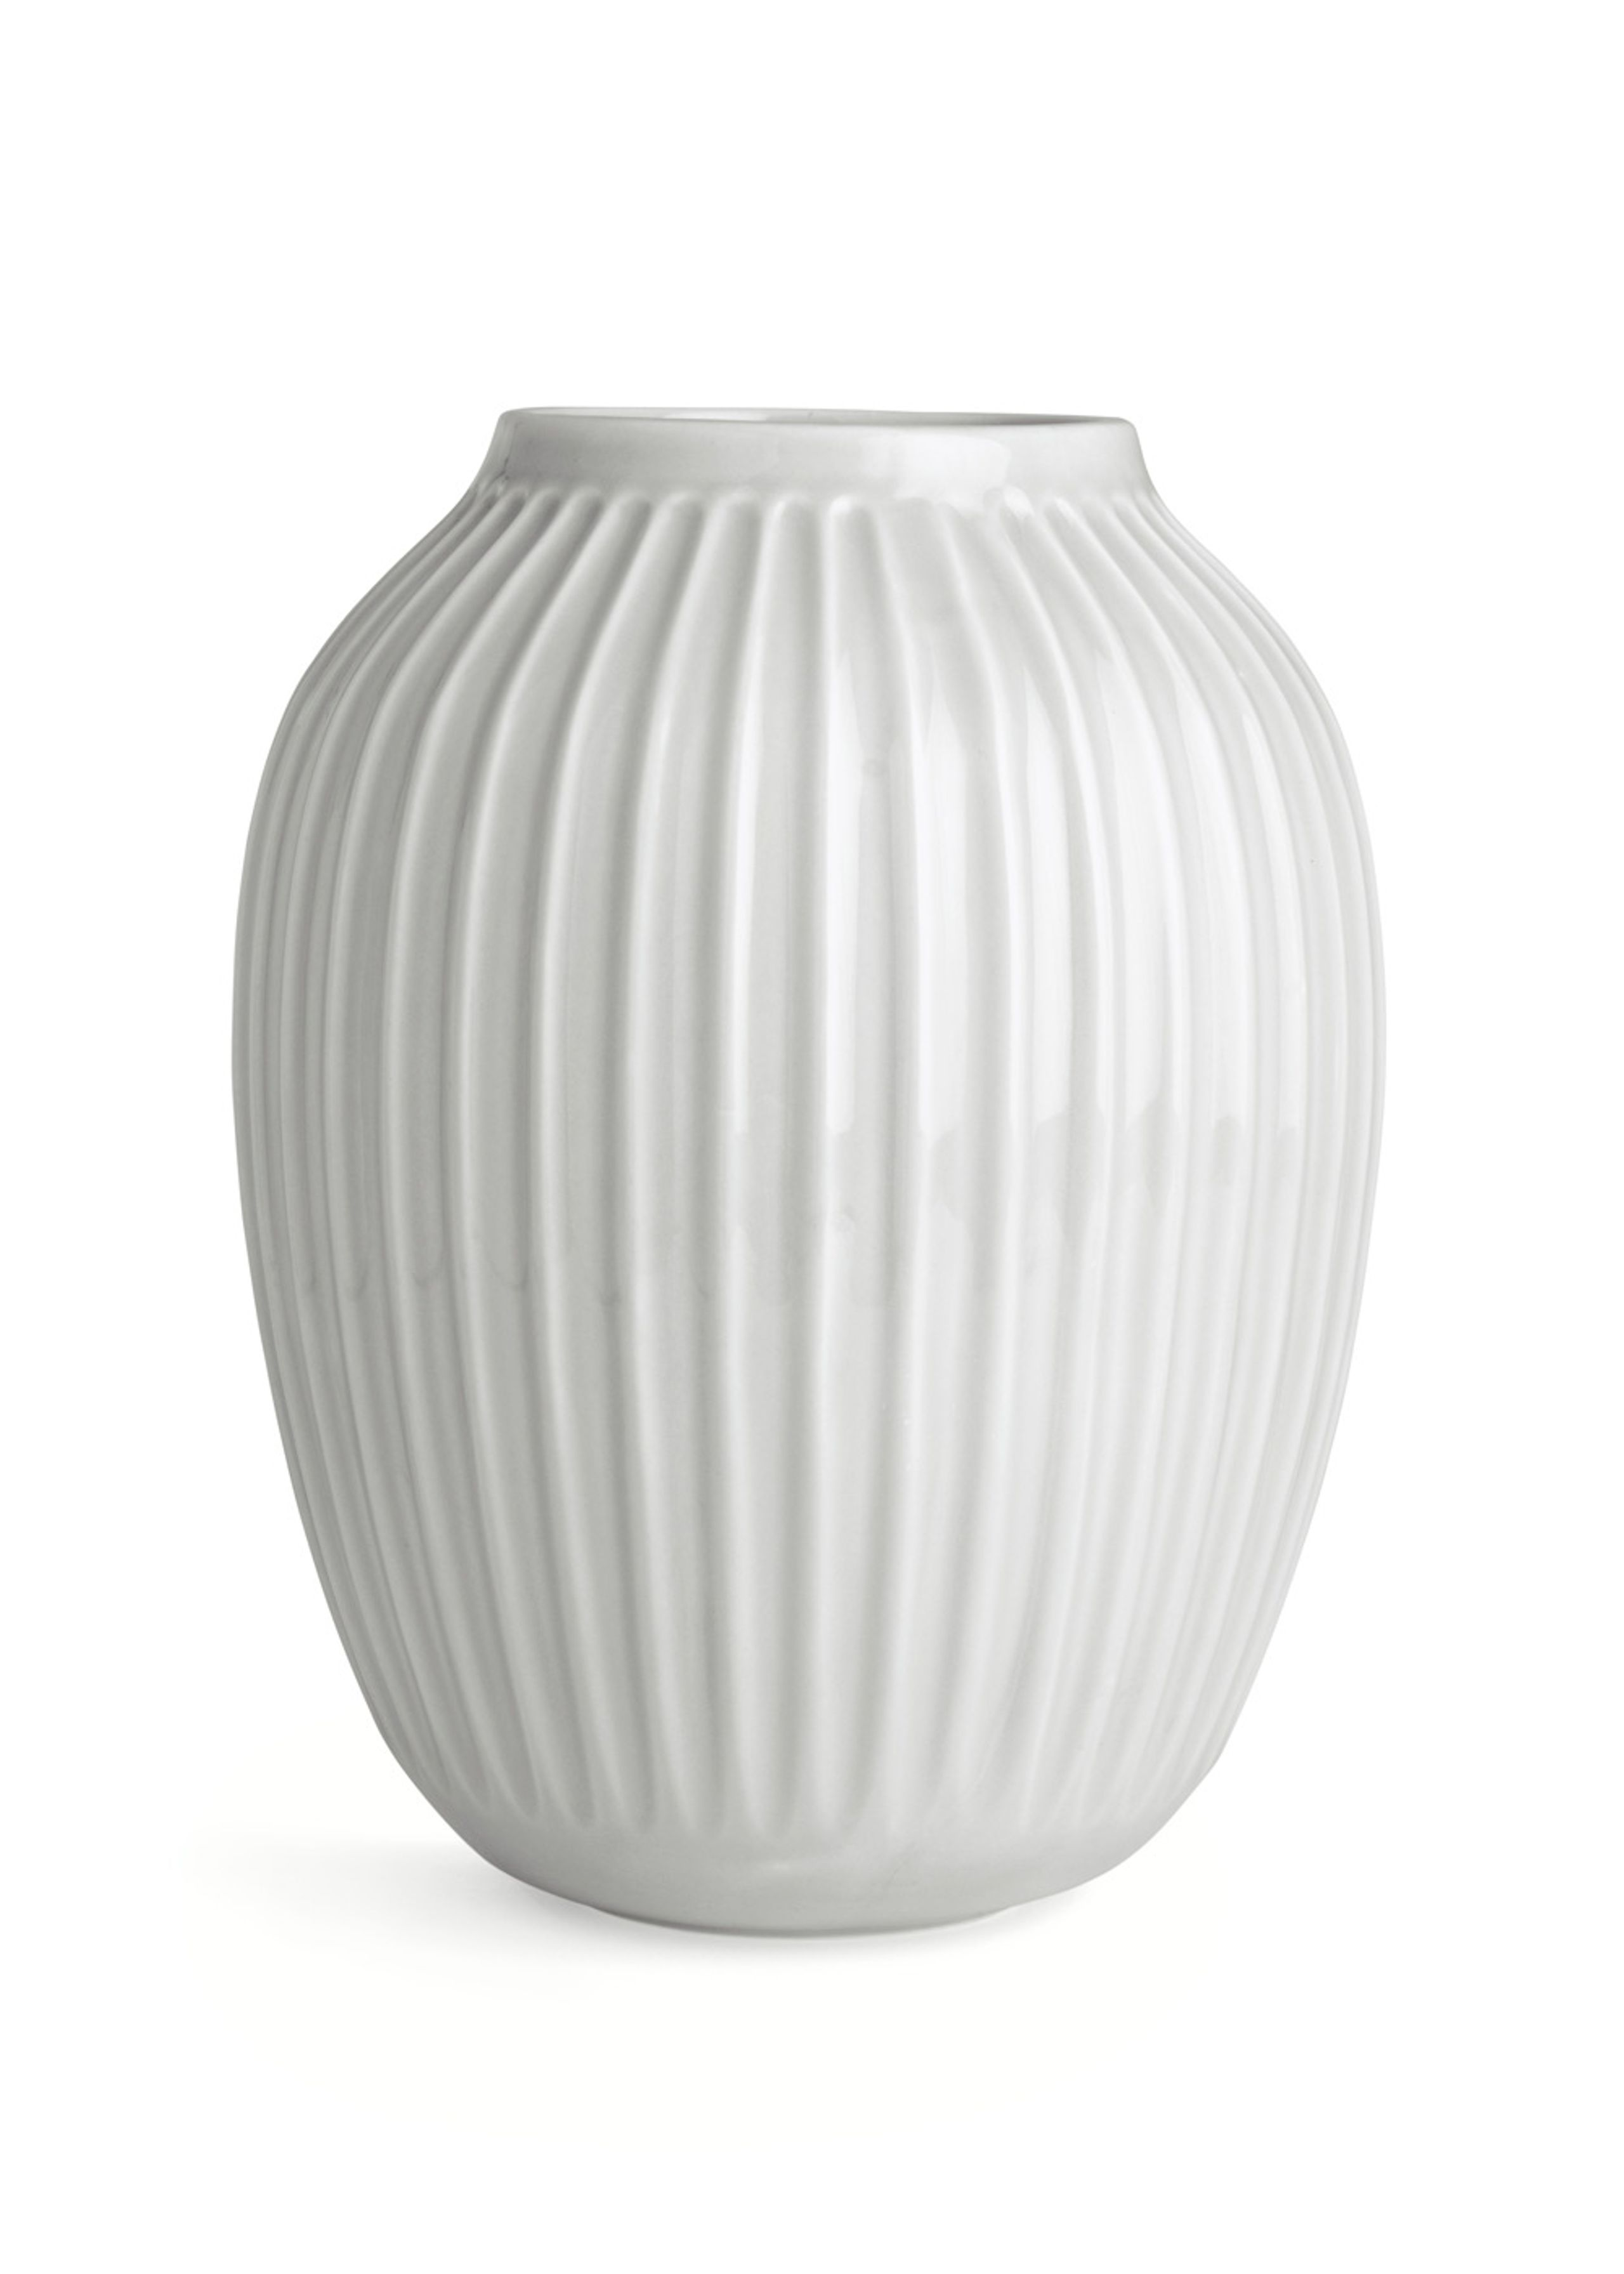 Hammershøi Vase - Vase - Kähler